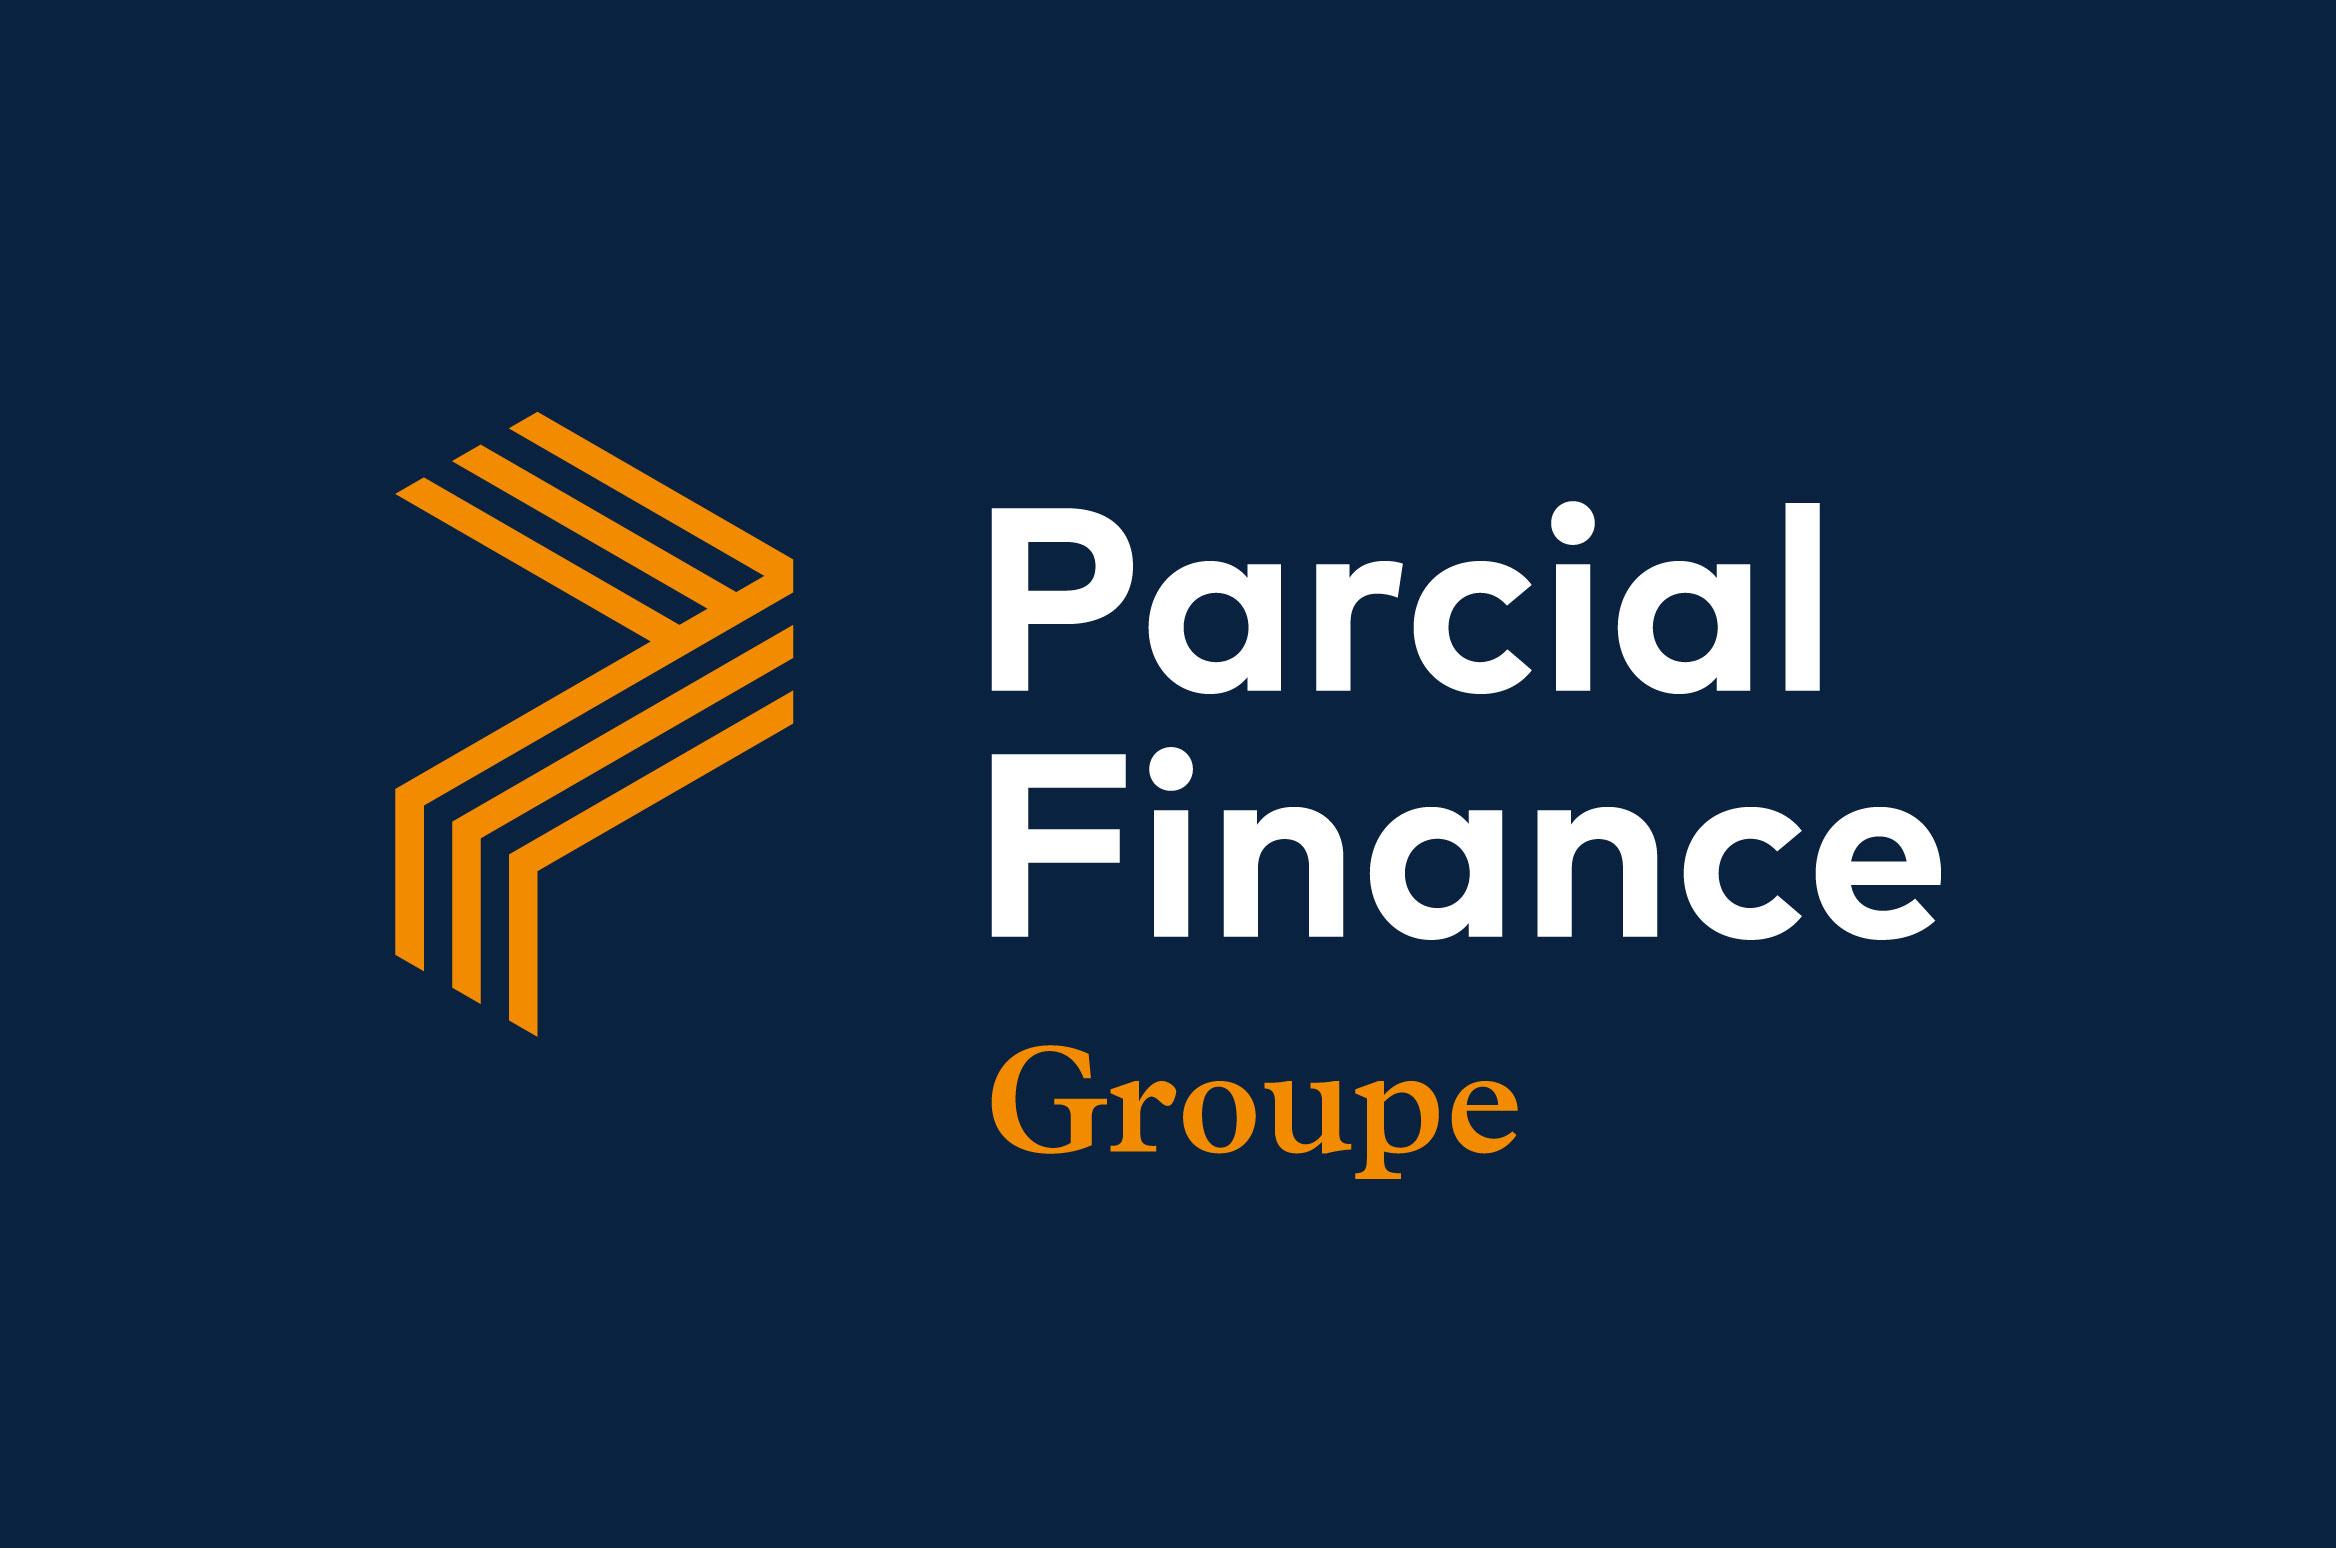 ParcialFinance Groupe